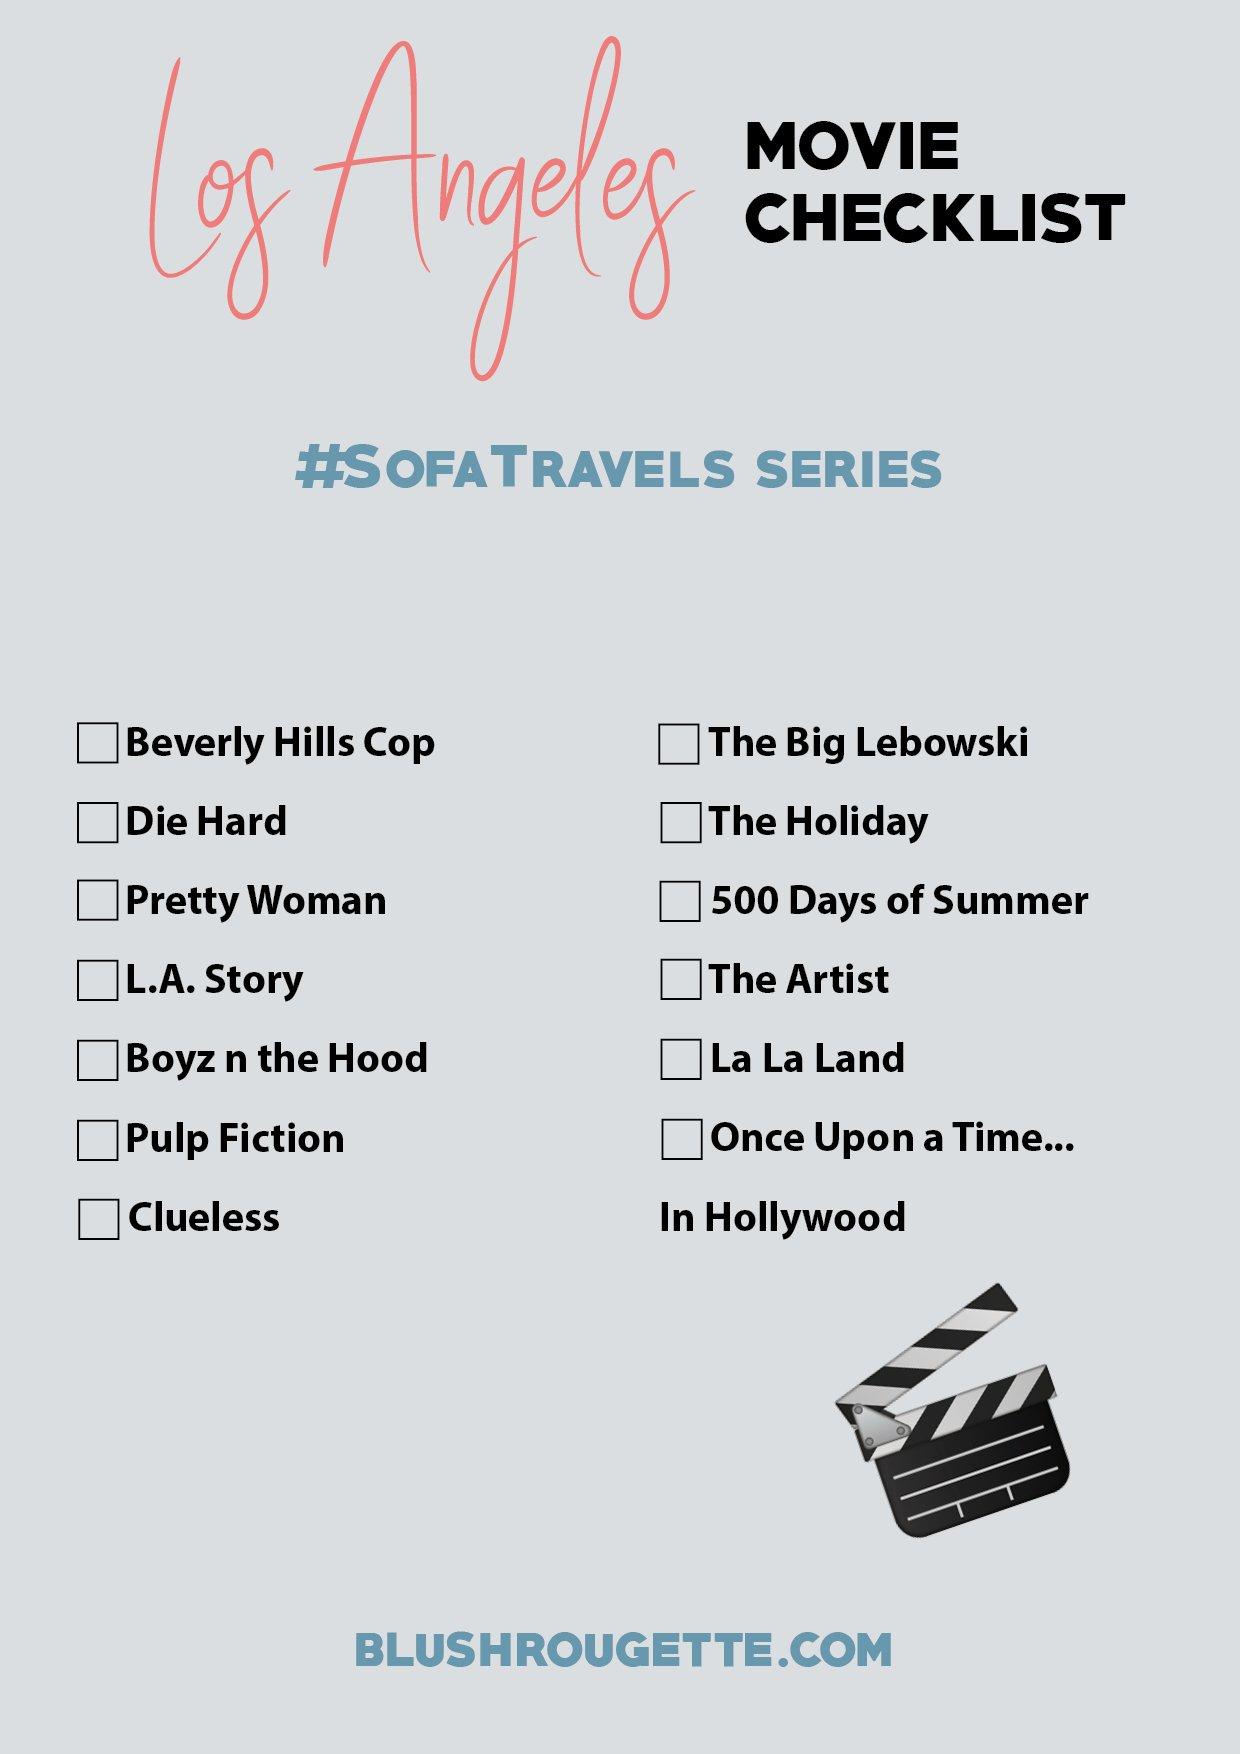 Best movies set in Los Angeles checklist